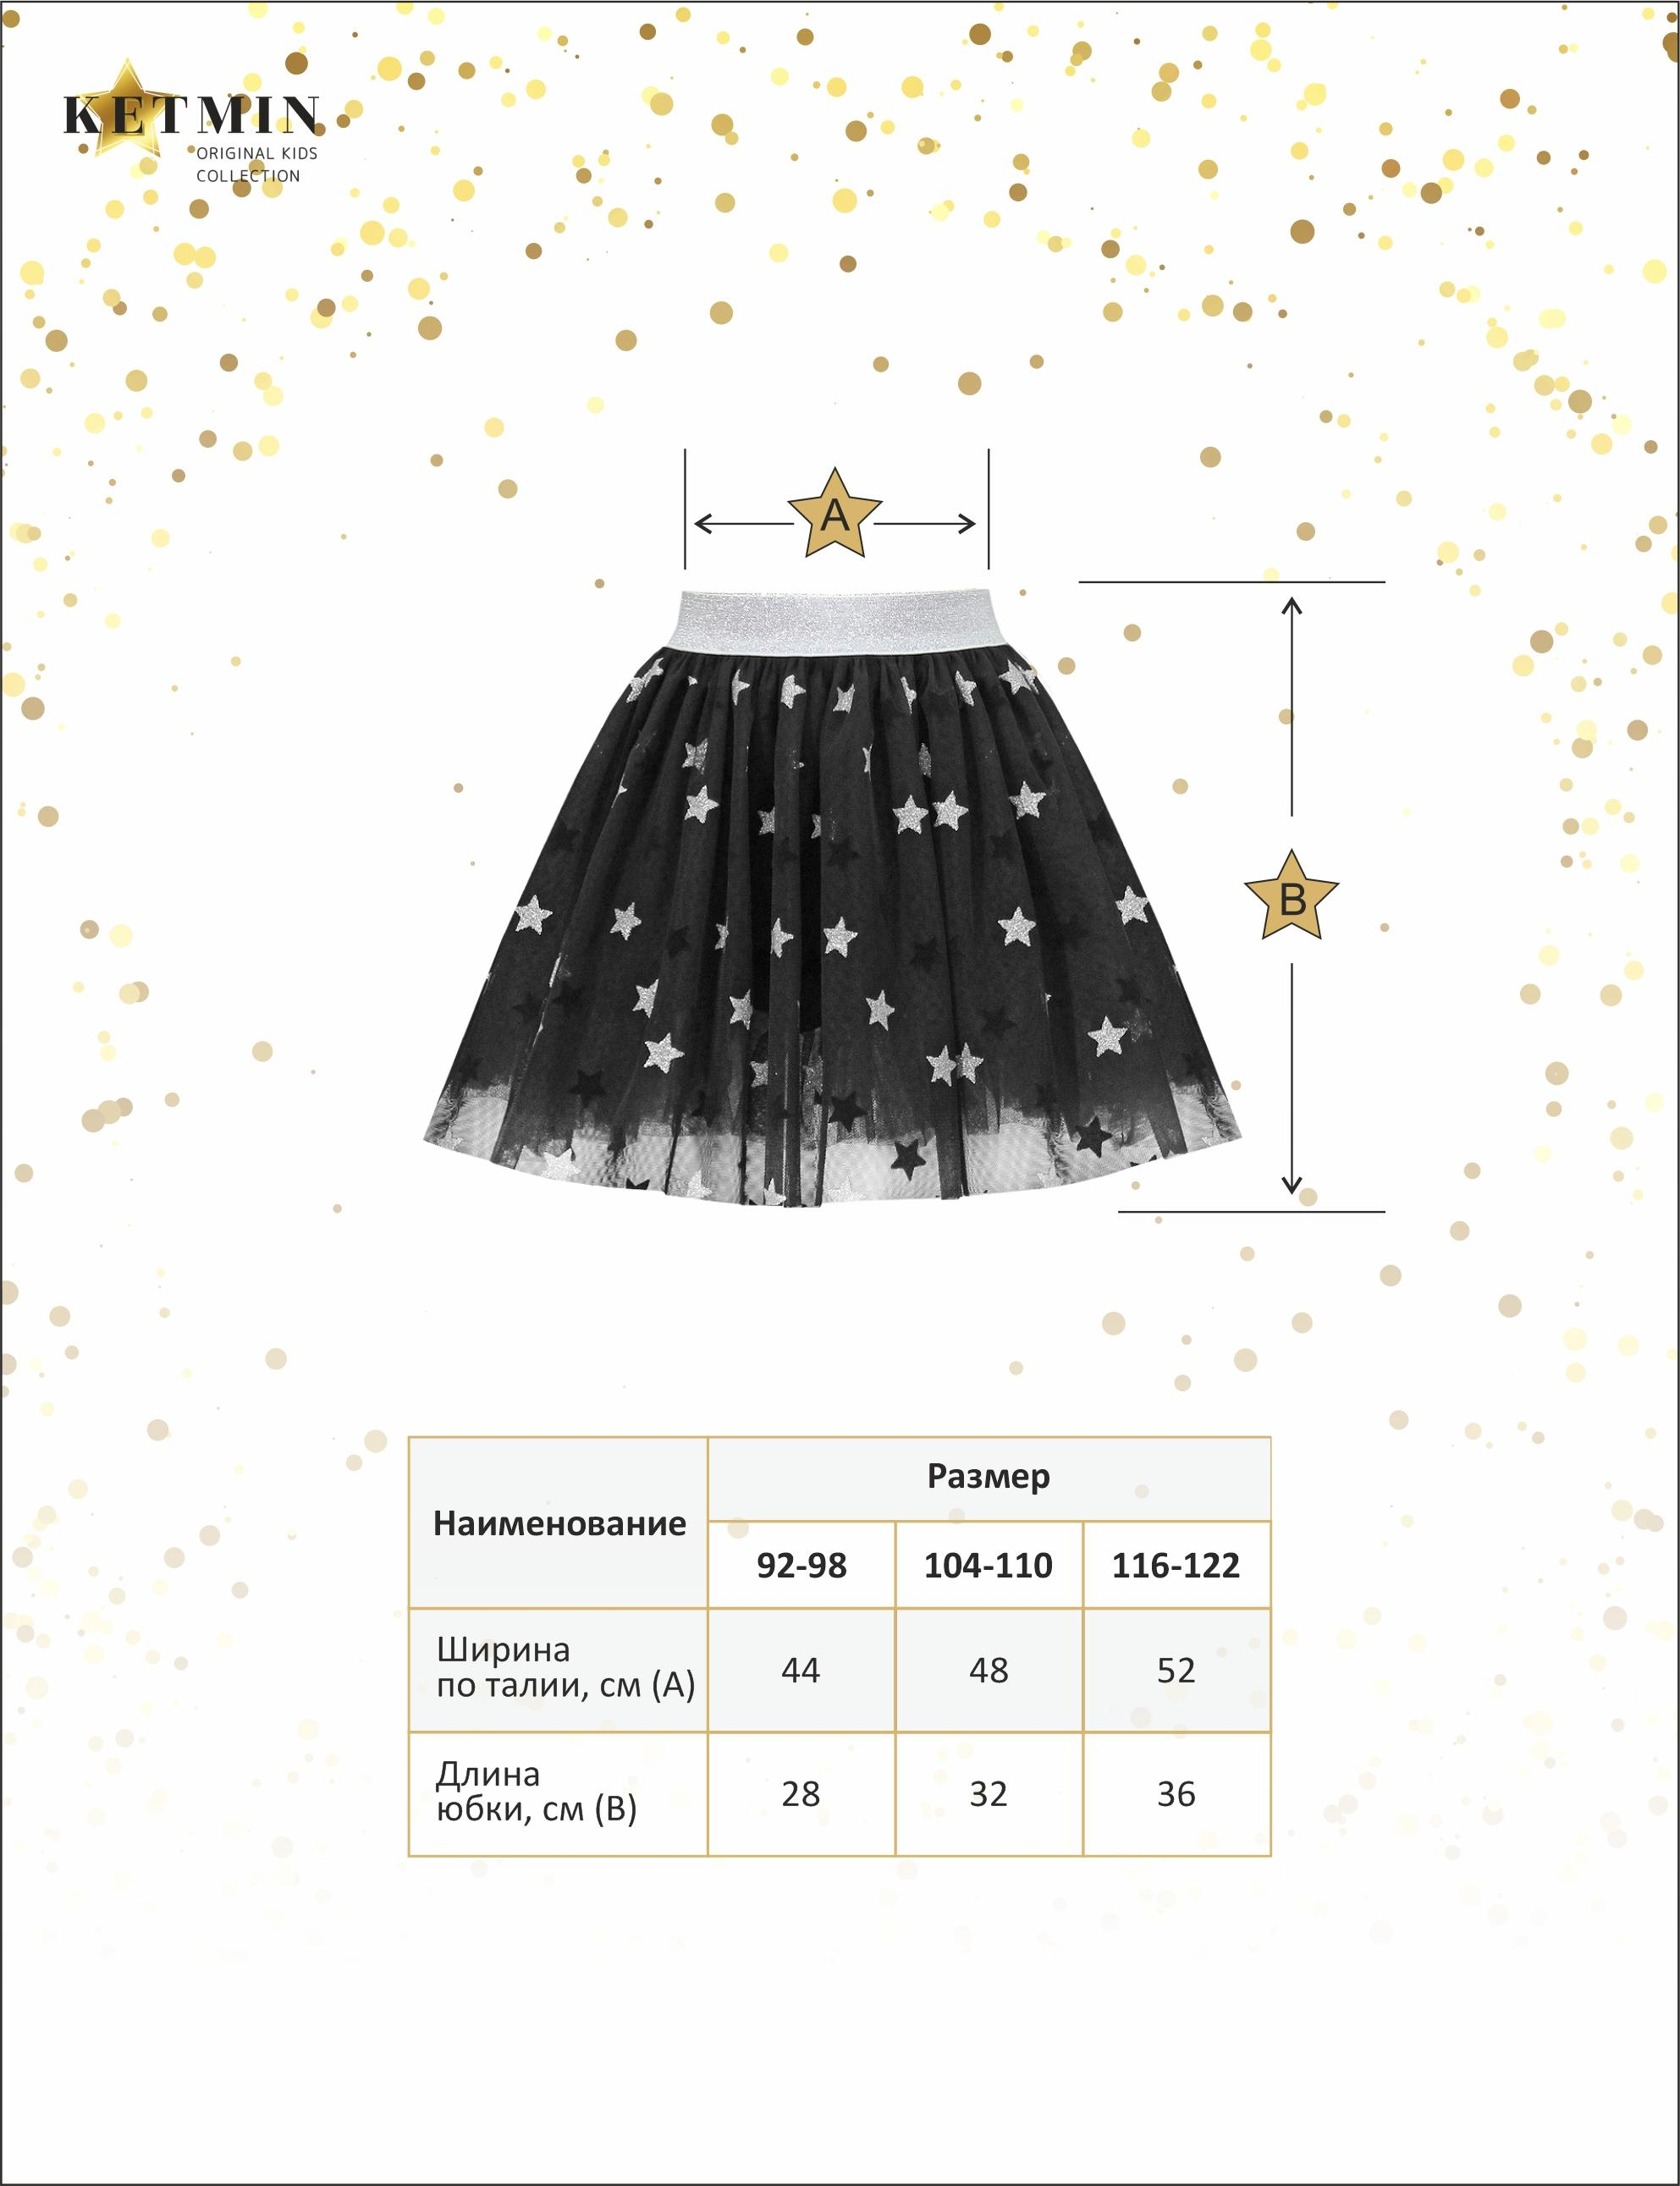 Юбка для девочки Miss KETMIN Звёзды на чёрном